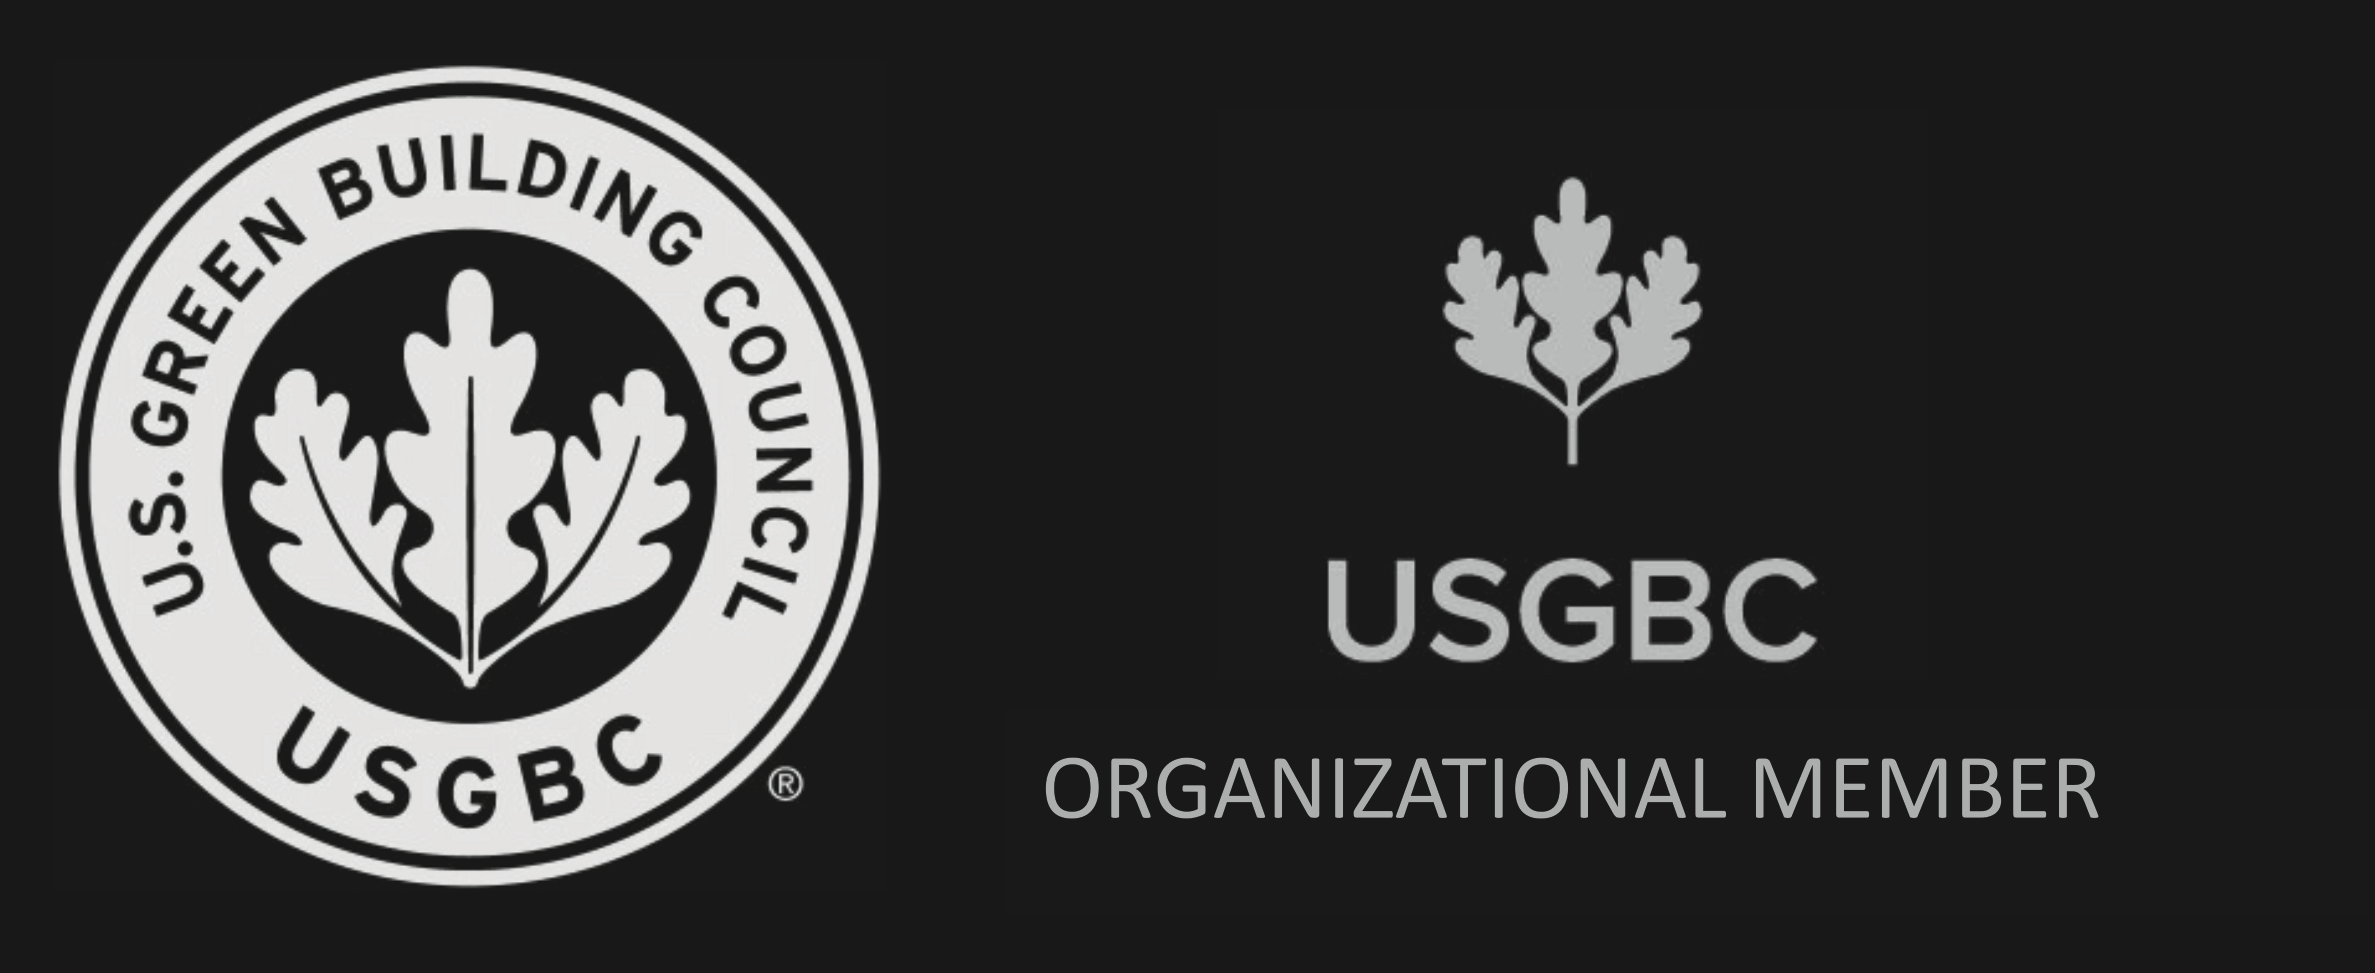 usgbc-4